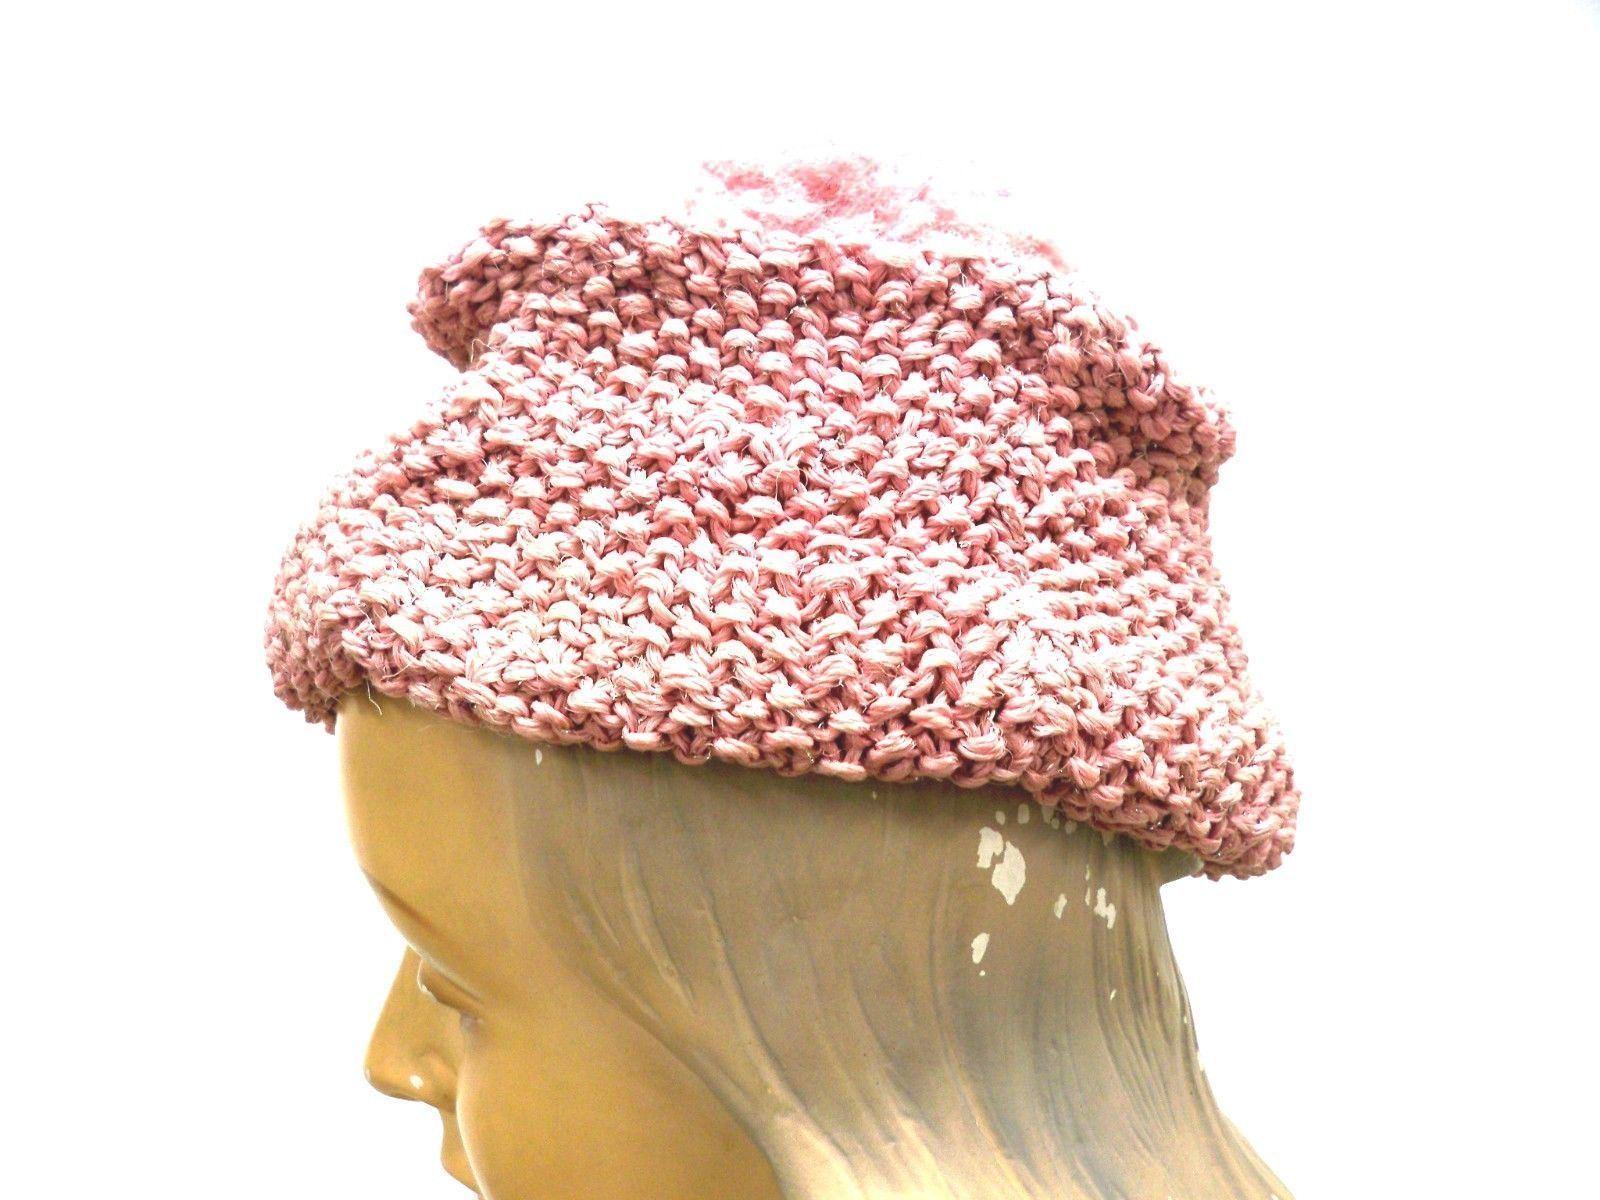 VTG Knit Hat Dusty Rose Pink Metallic Hand-Knit 1… - image 7